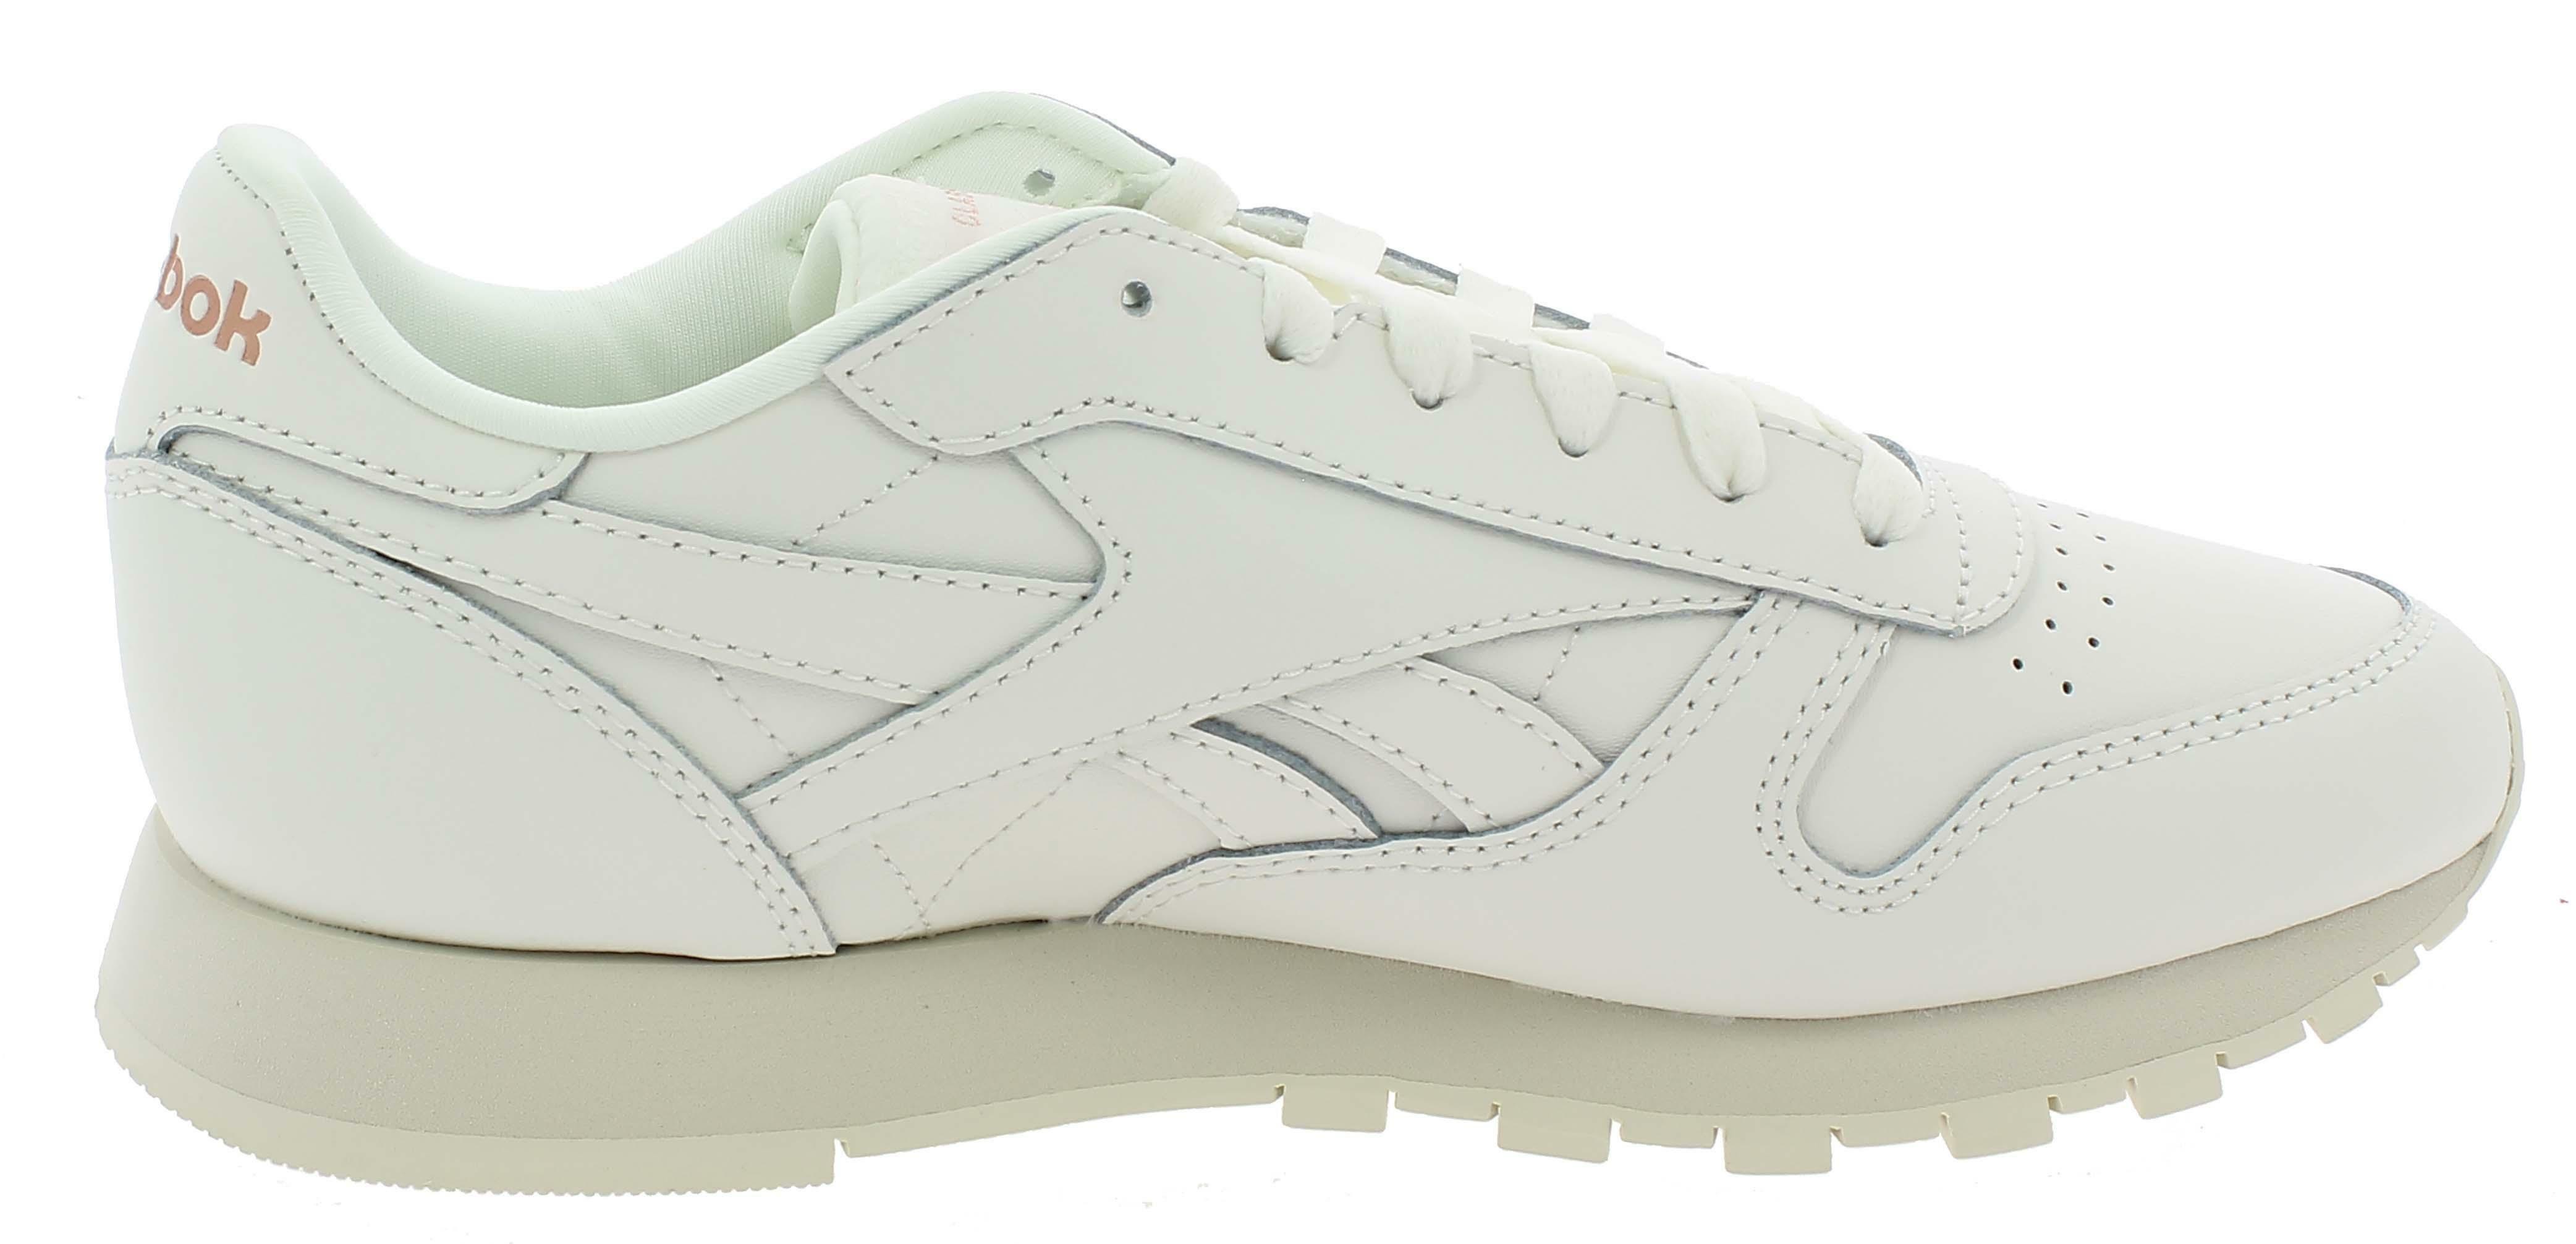 Reebok Weiss Dv3762 Sportschuhe Damen Classic Leather WDIHE29Y